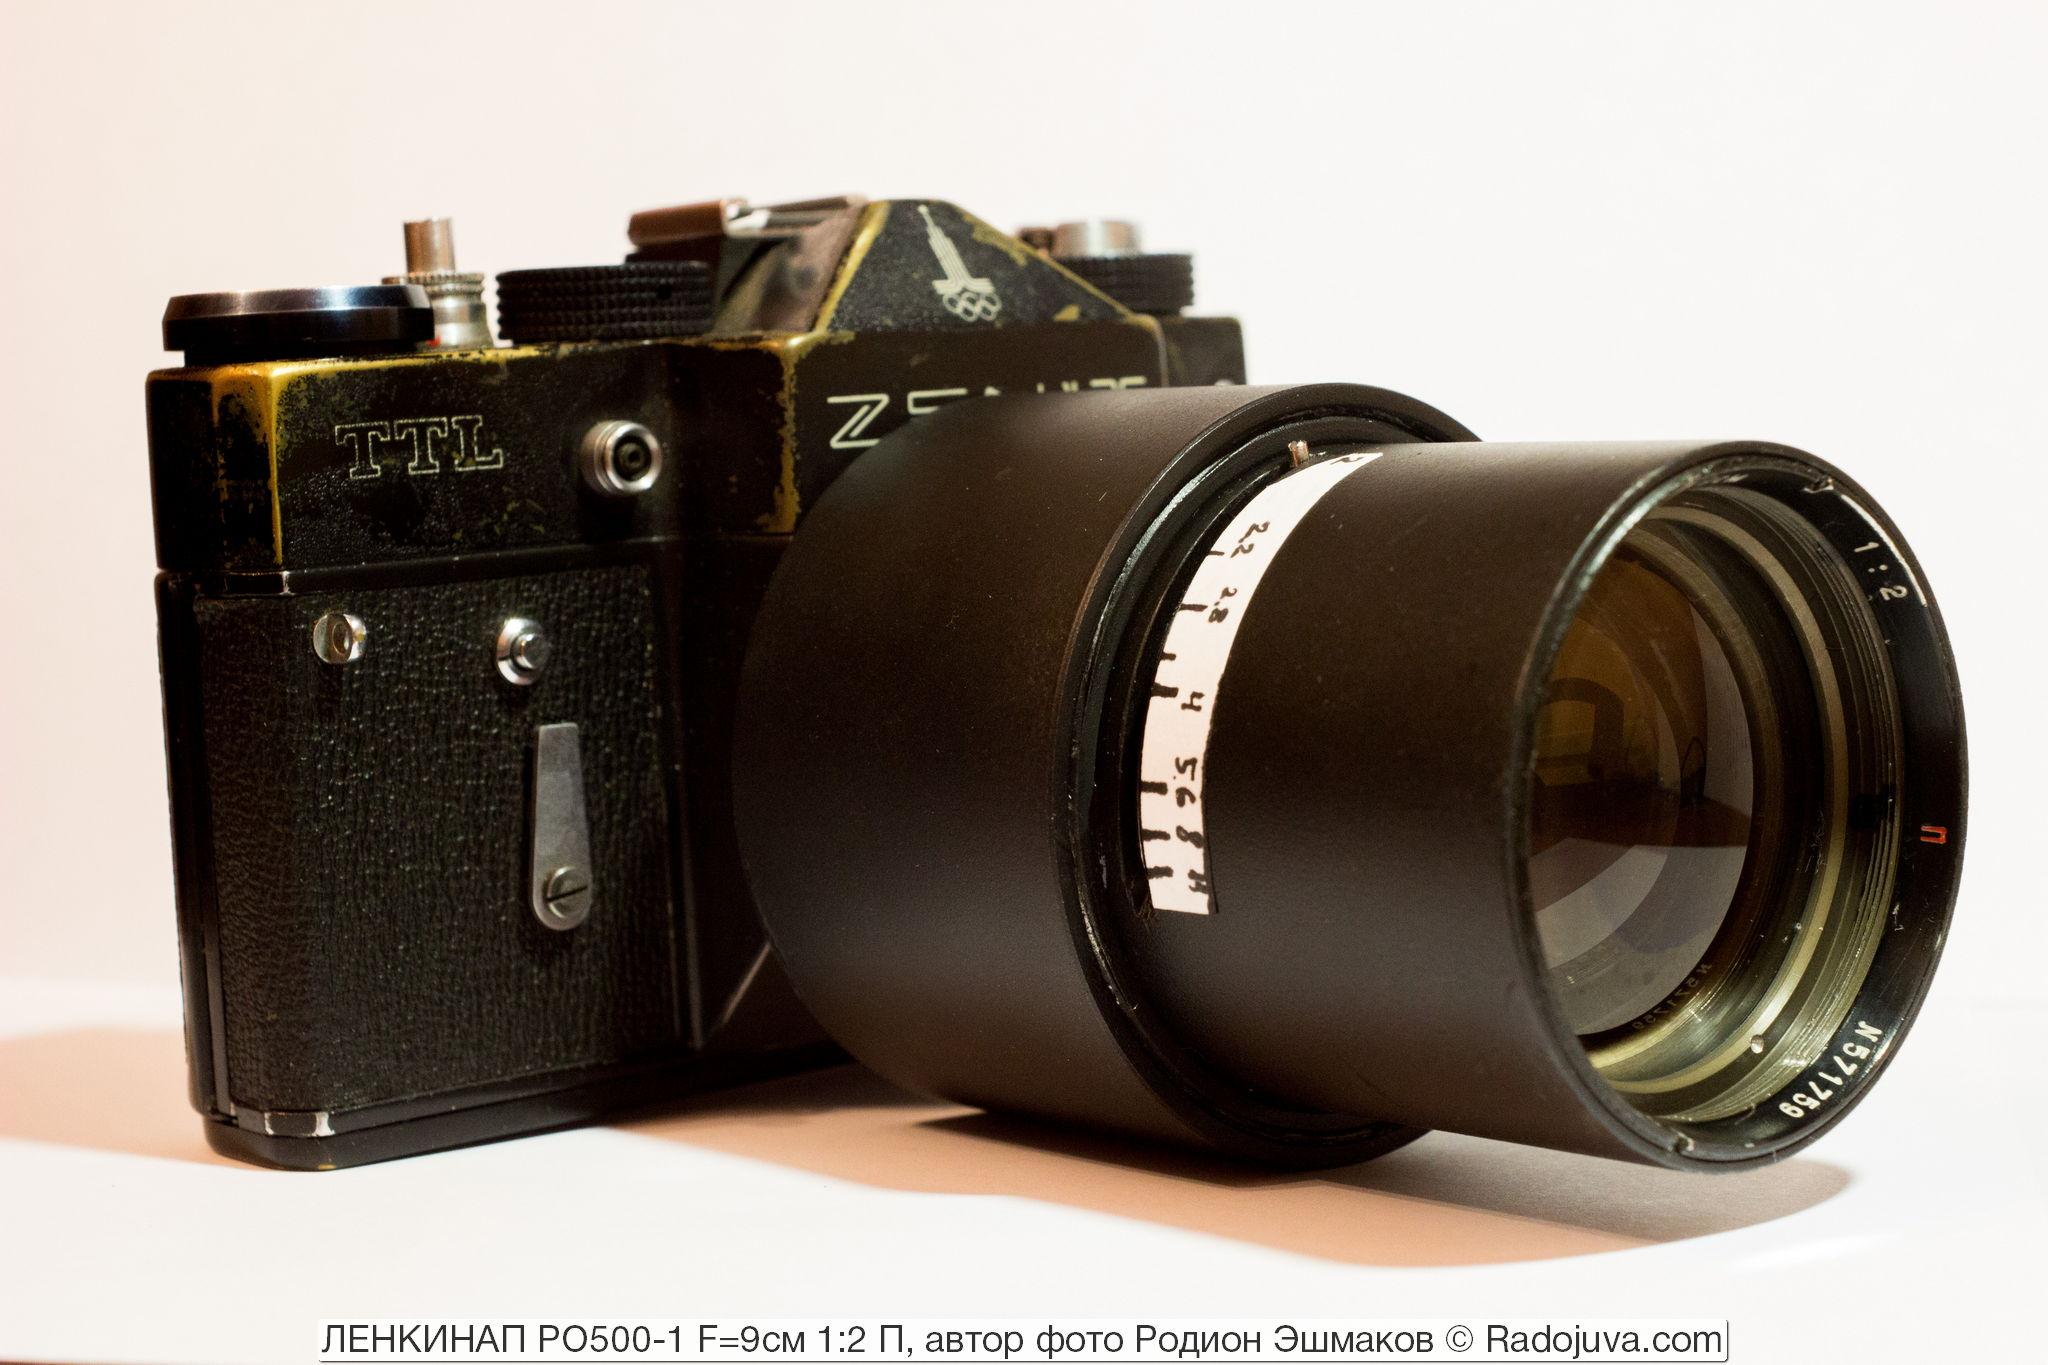 РО500-1 после адаптации на камере Зенит TTL